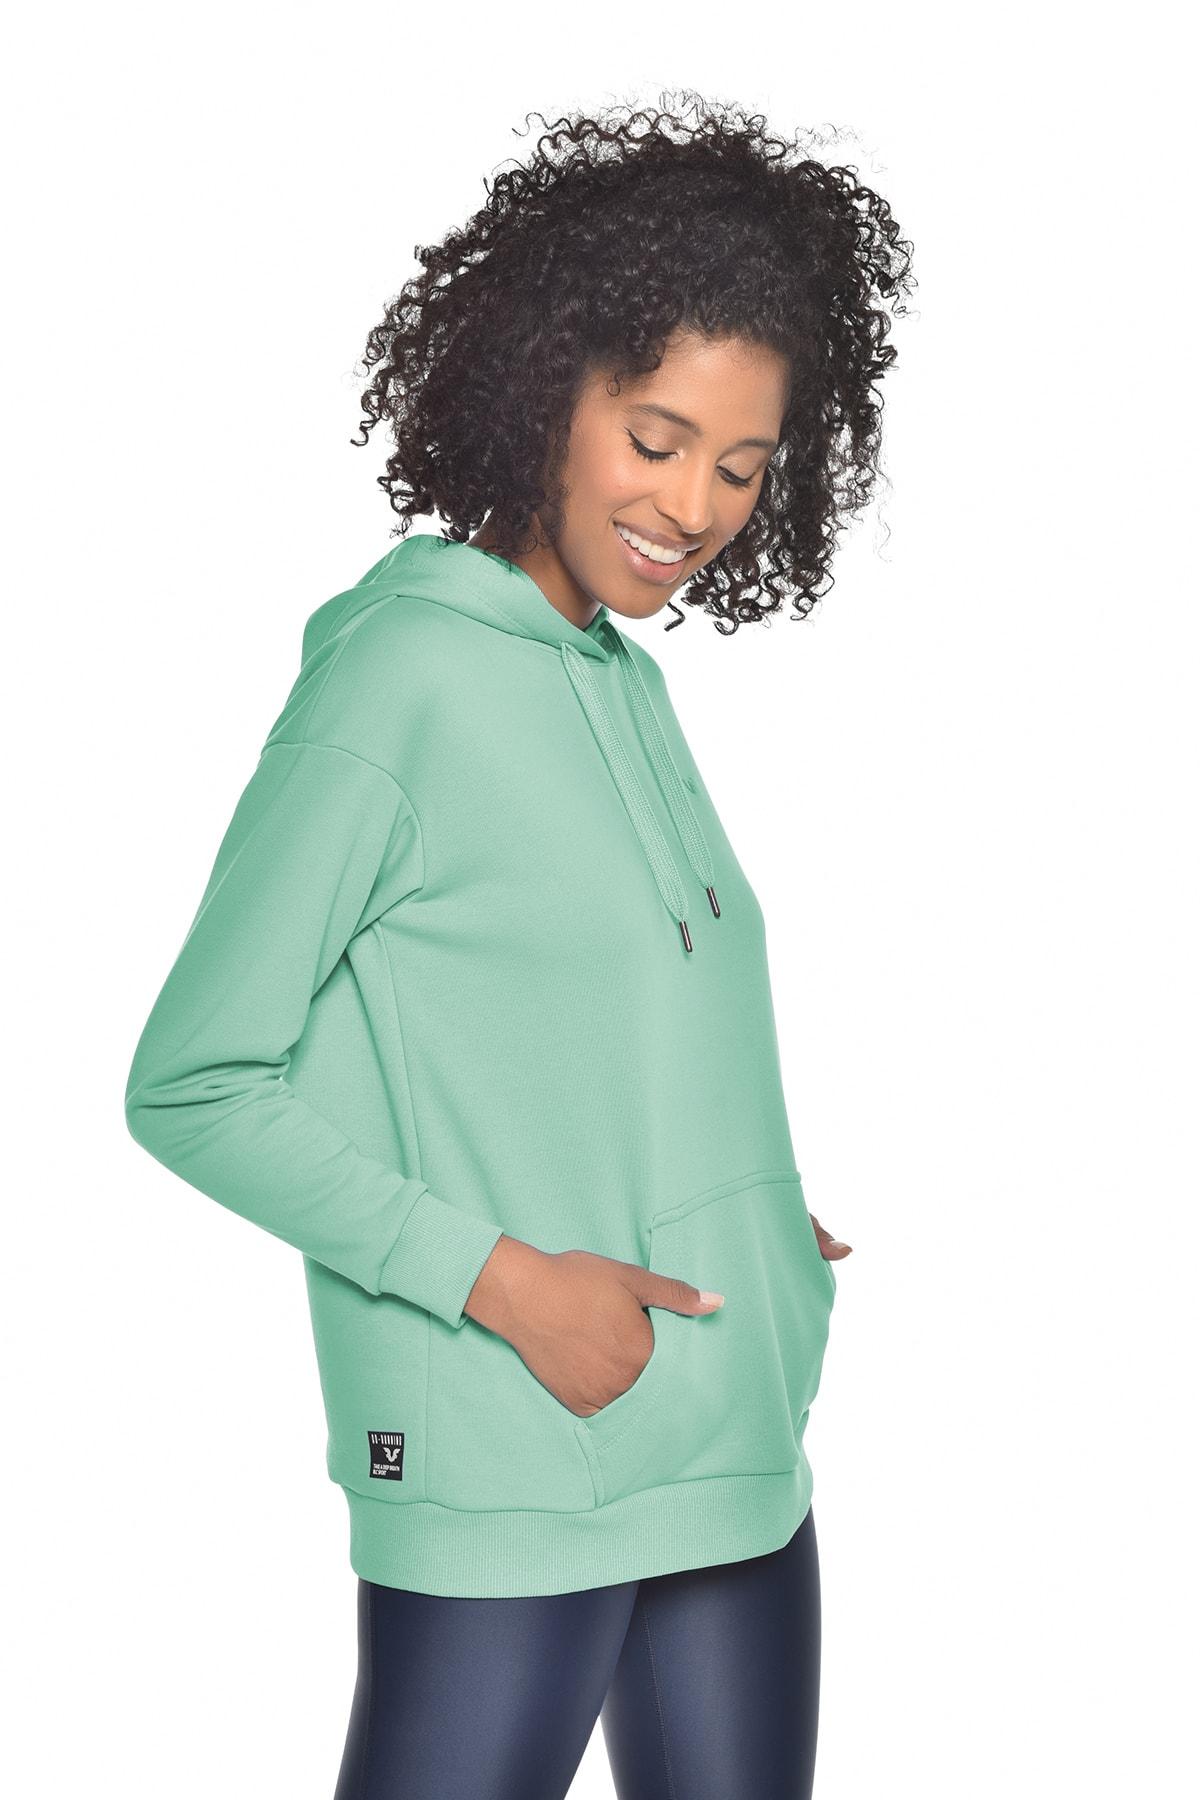 bilcee Yeşil Kadın Kapüşonlu Sweatshırt Gw-8785 2